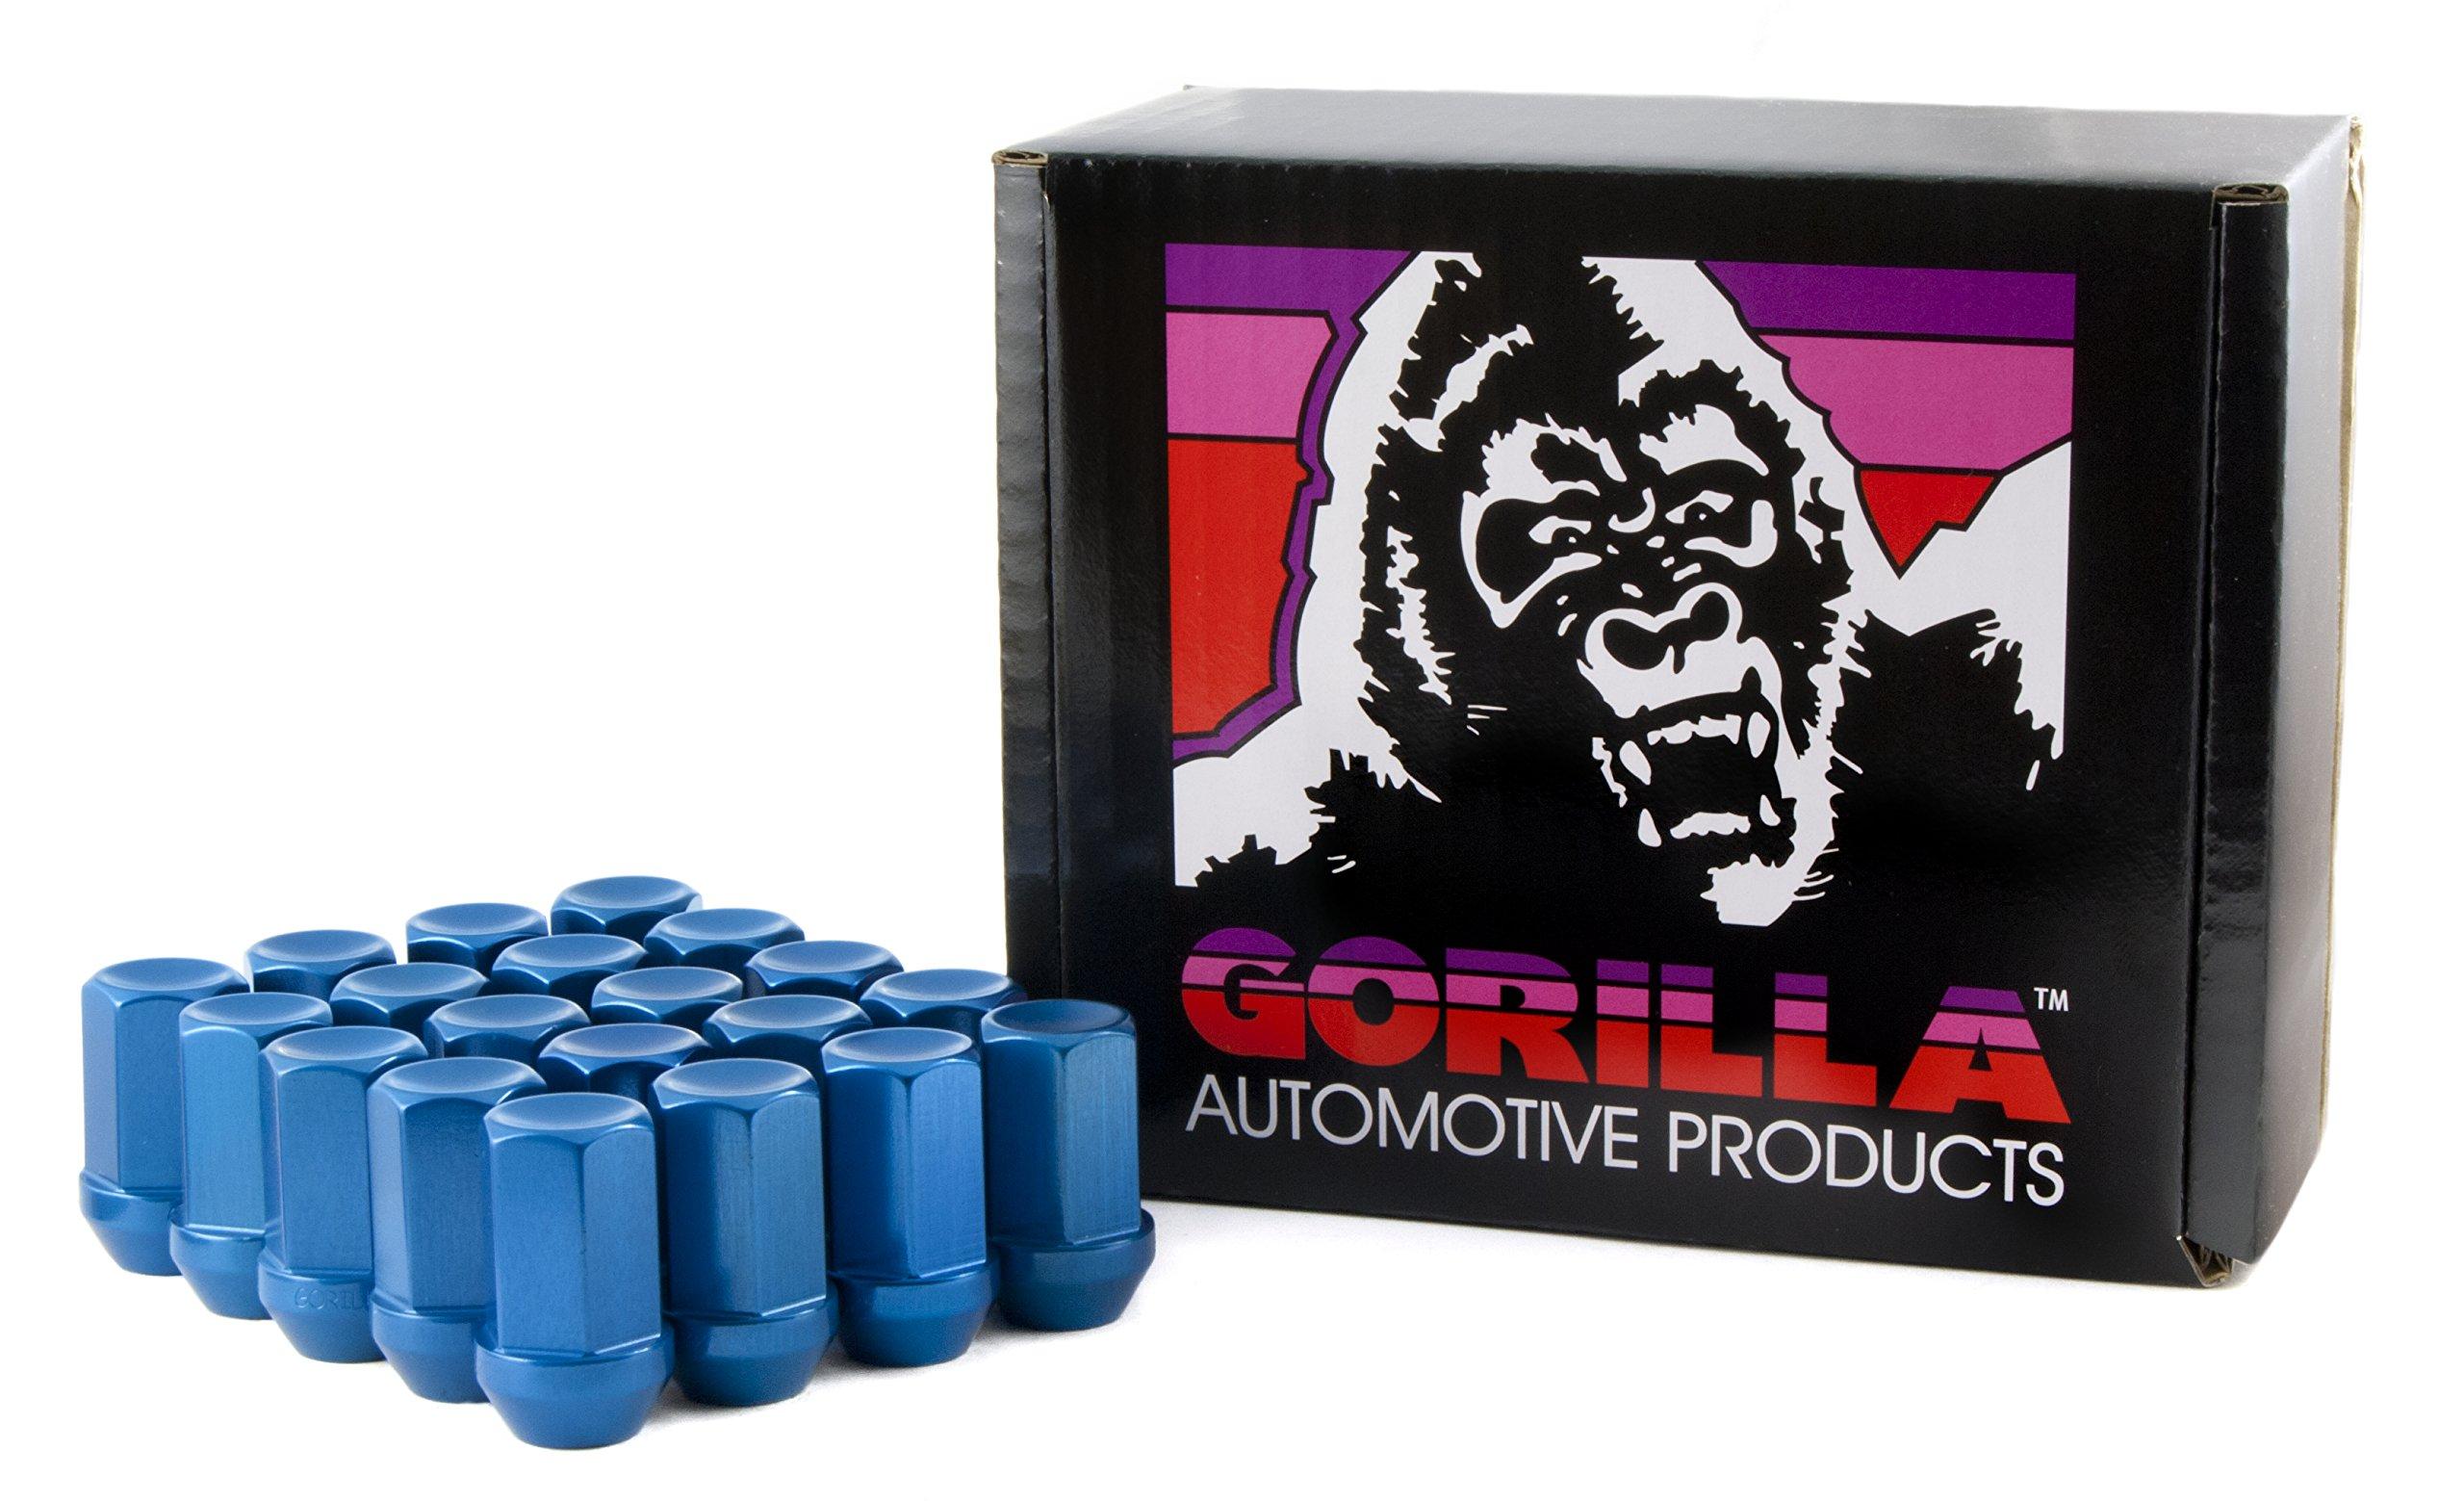 Gorilla Automotive 44128BL-20 Blue 12mm x 1.25 Thread Size Aluminum Closed End Racing Lug Nut, (Pack of 20)